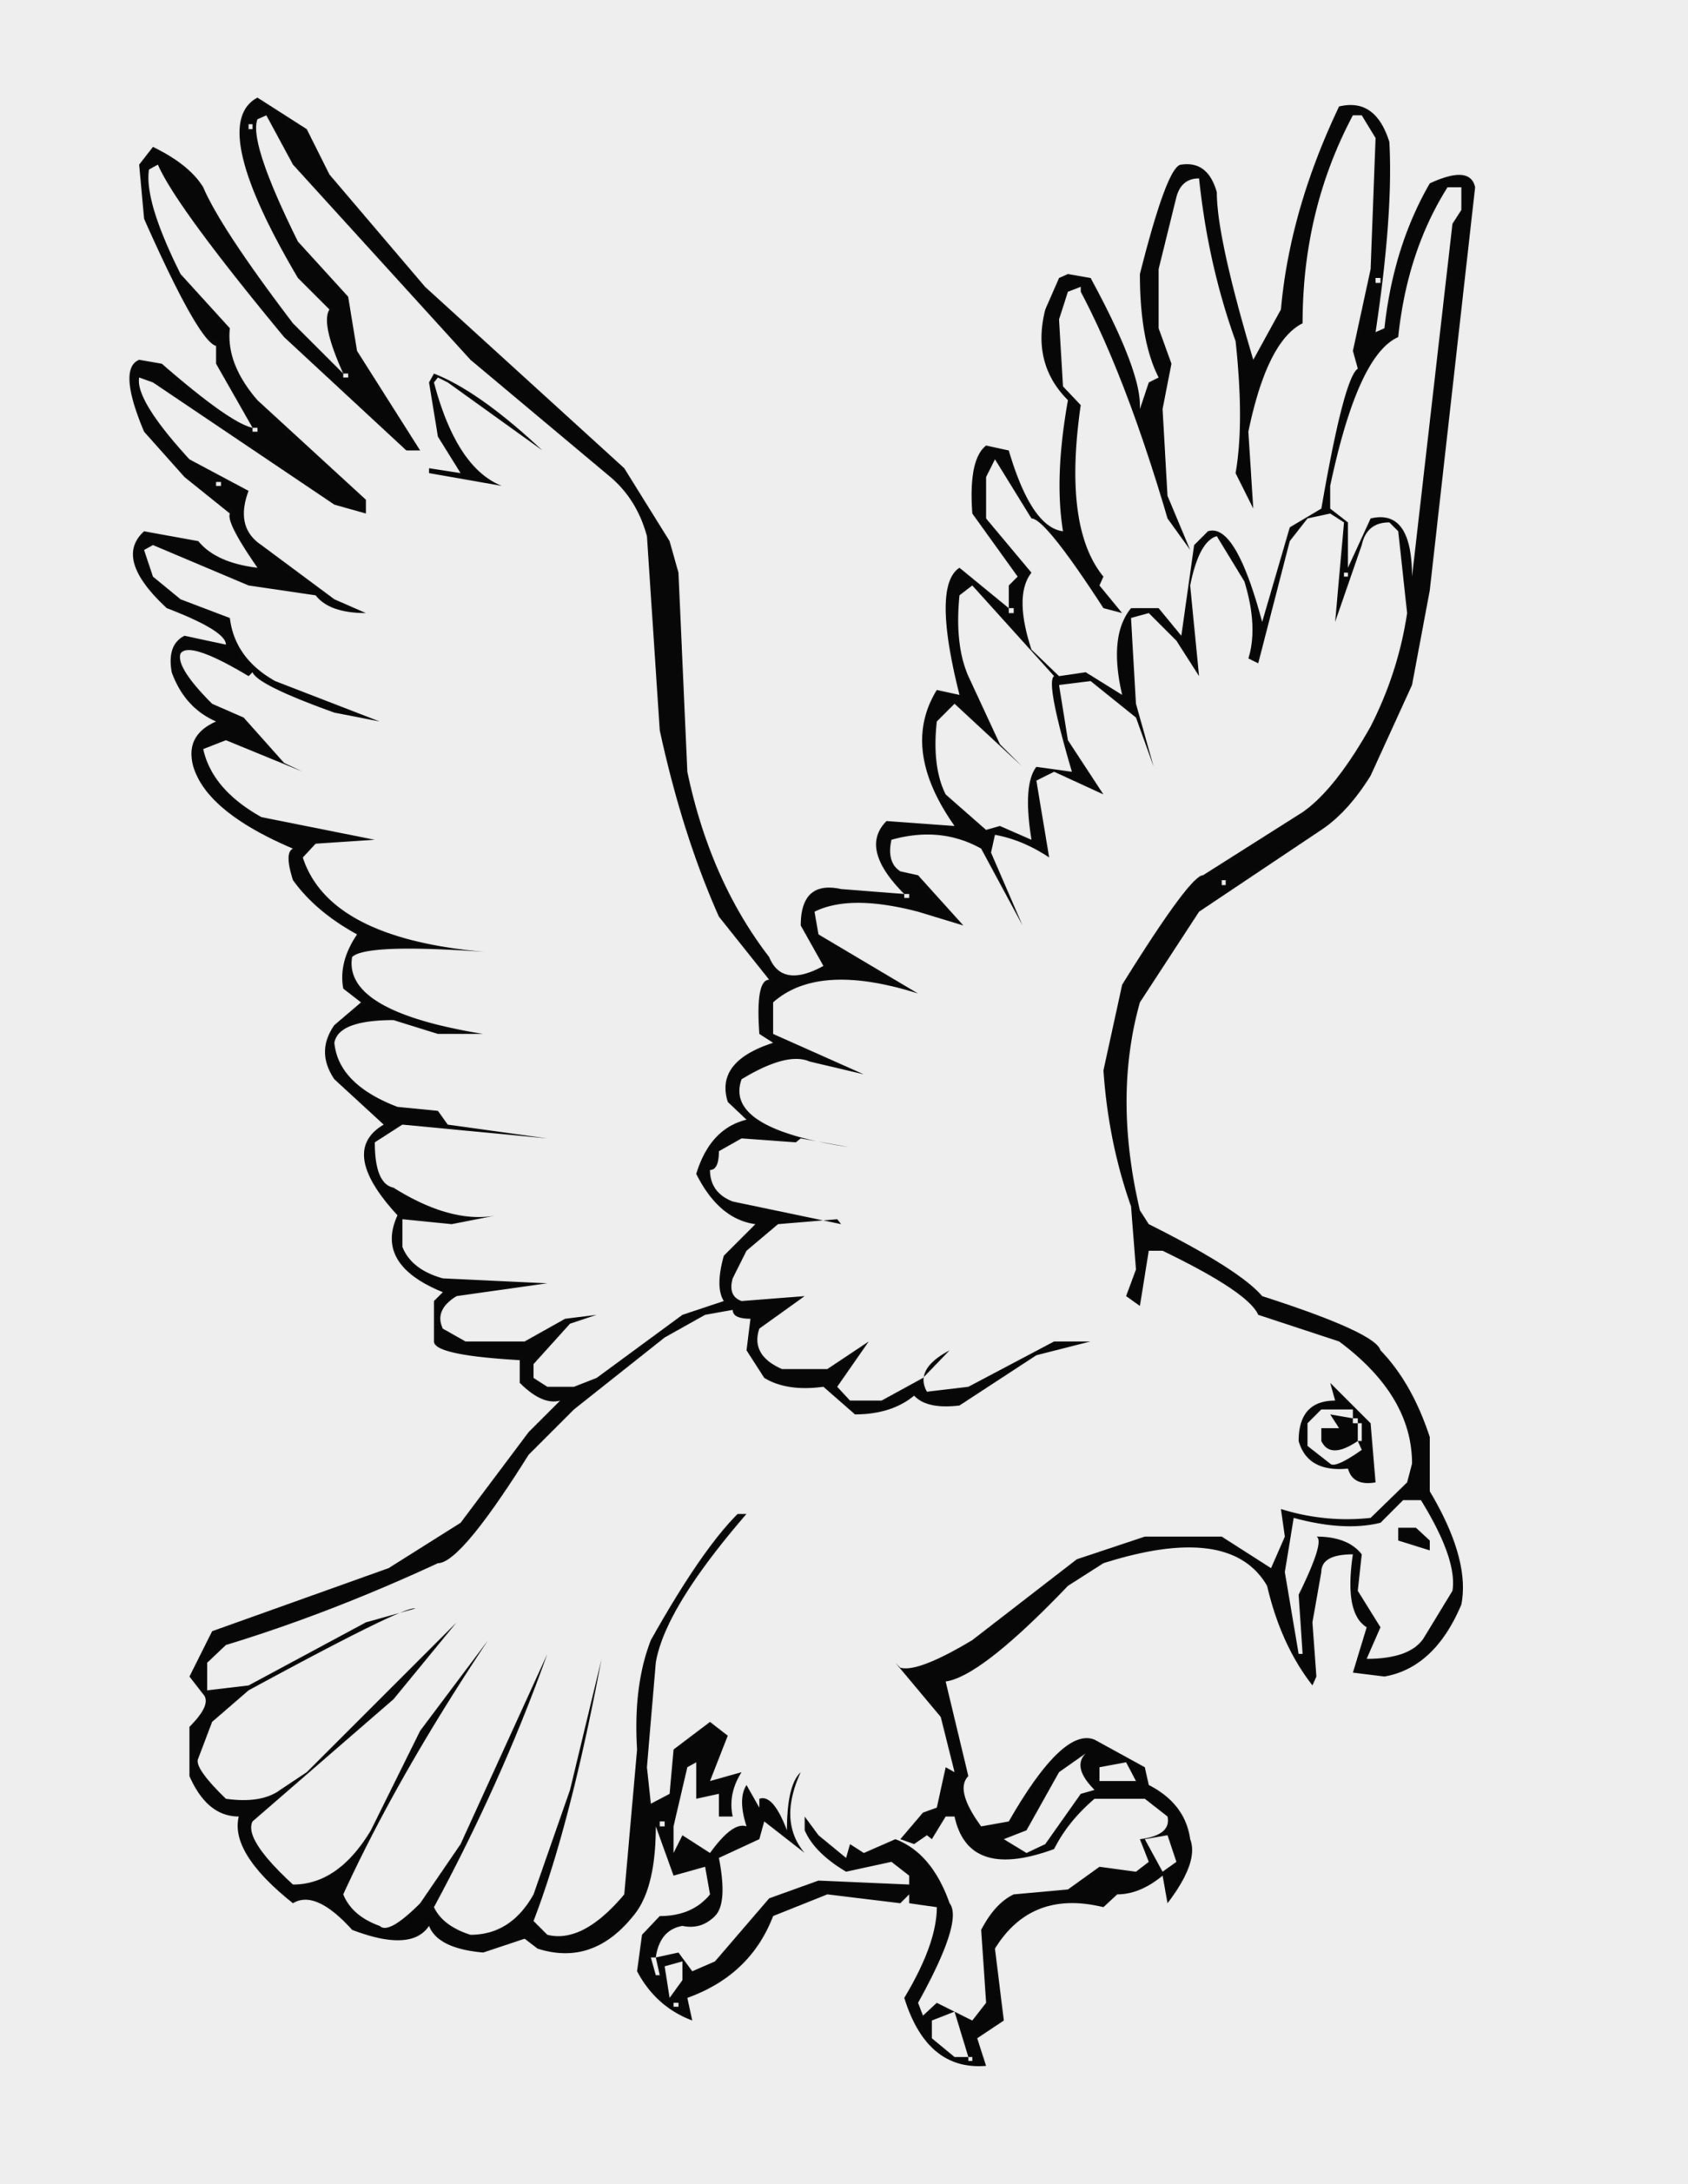 Dove Wings Drawing At Getdrawings